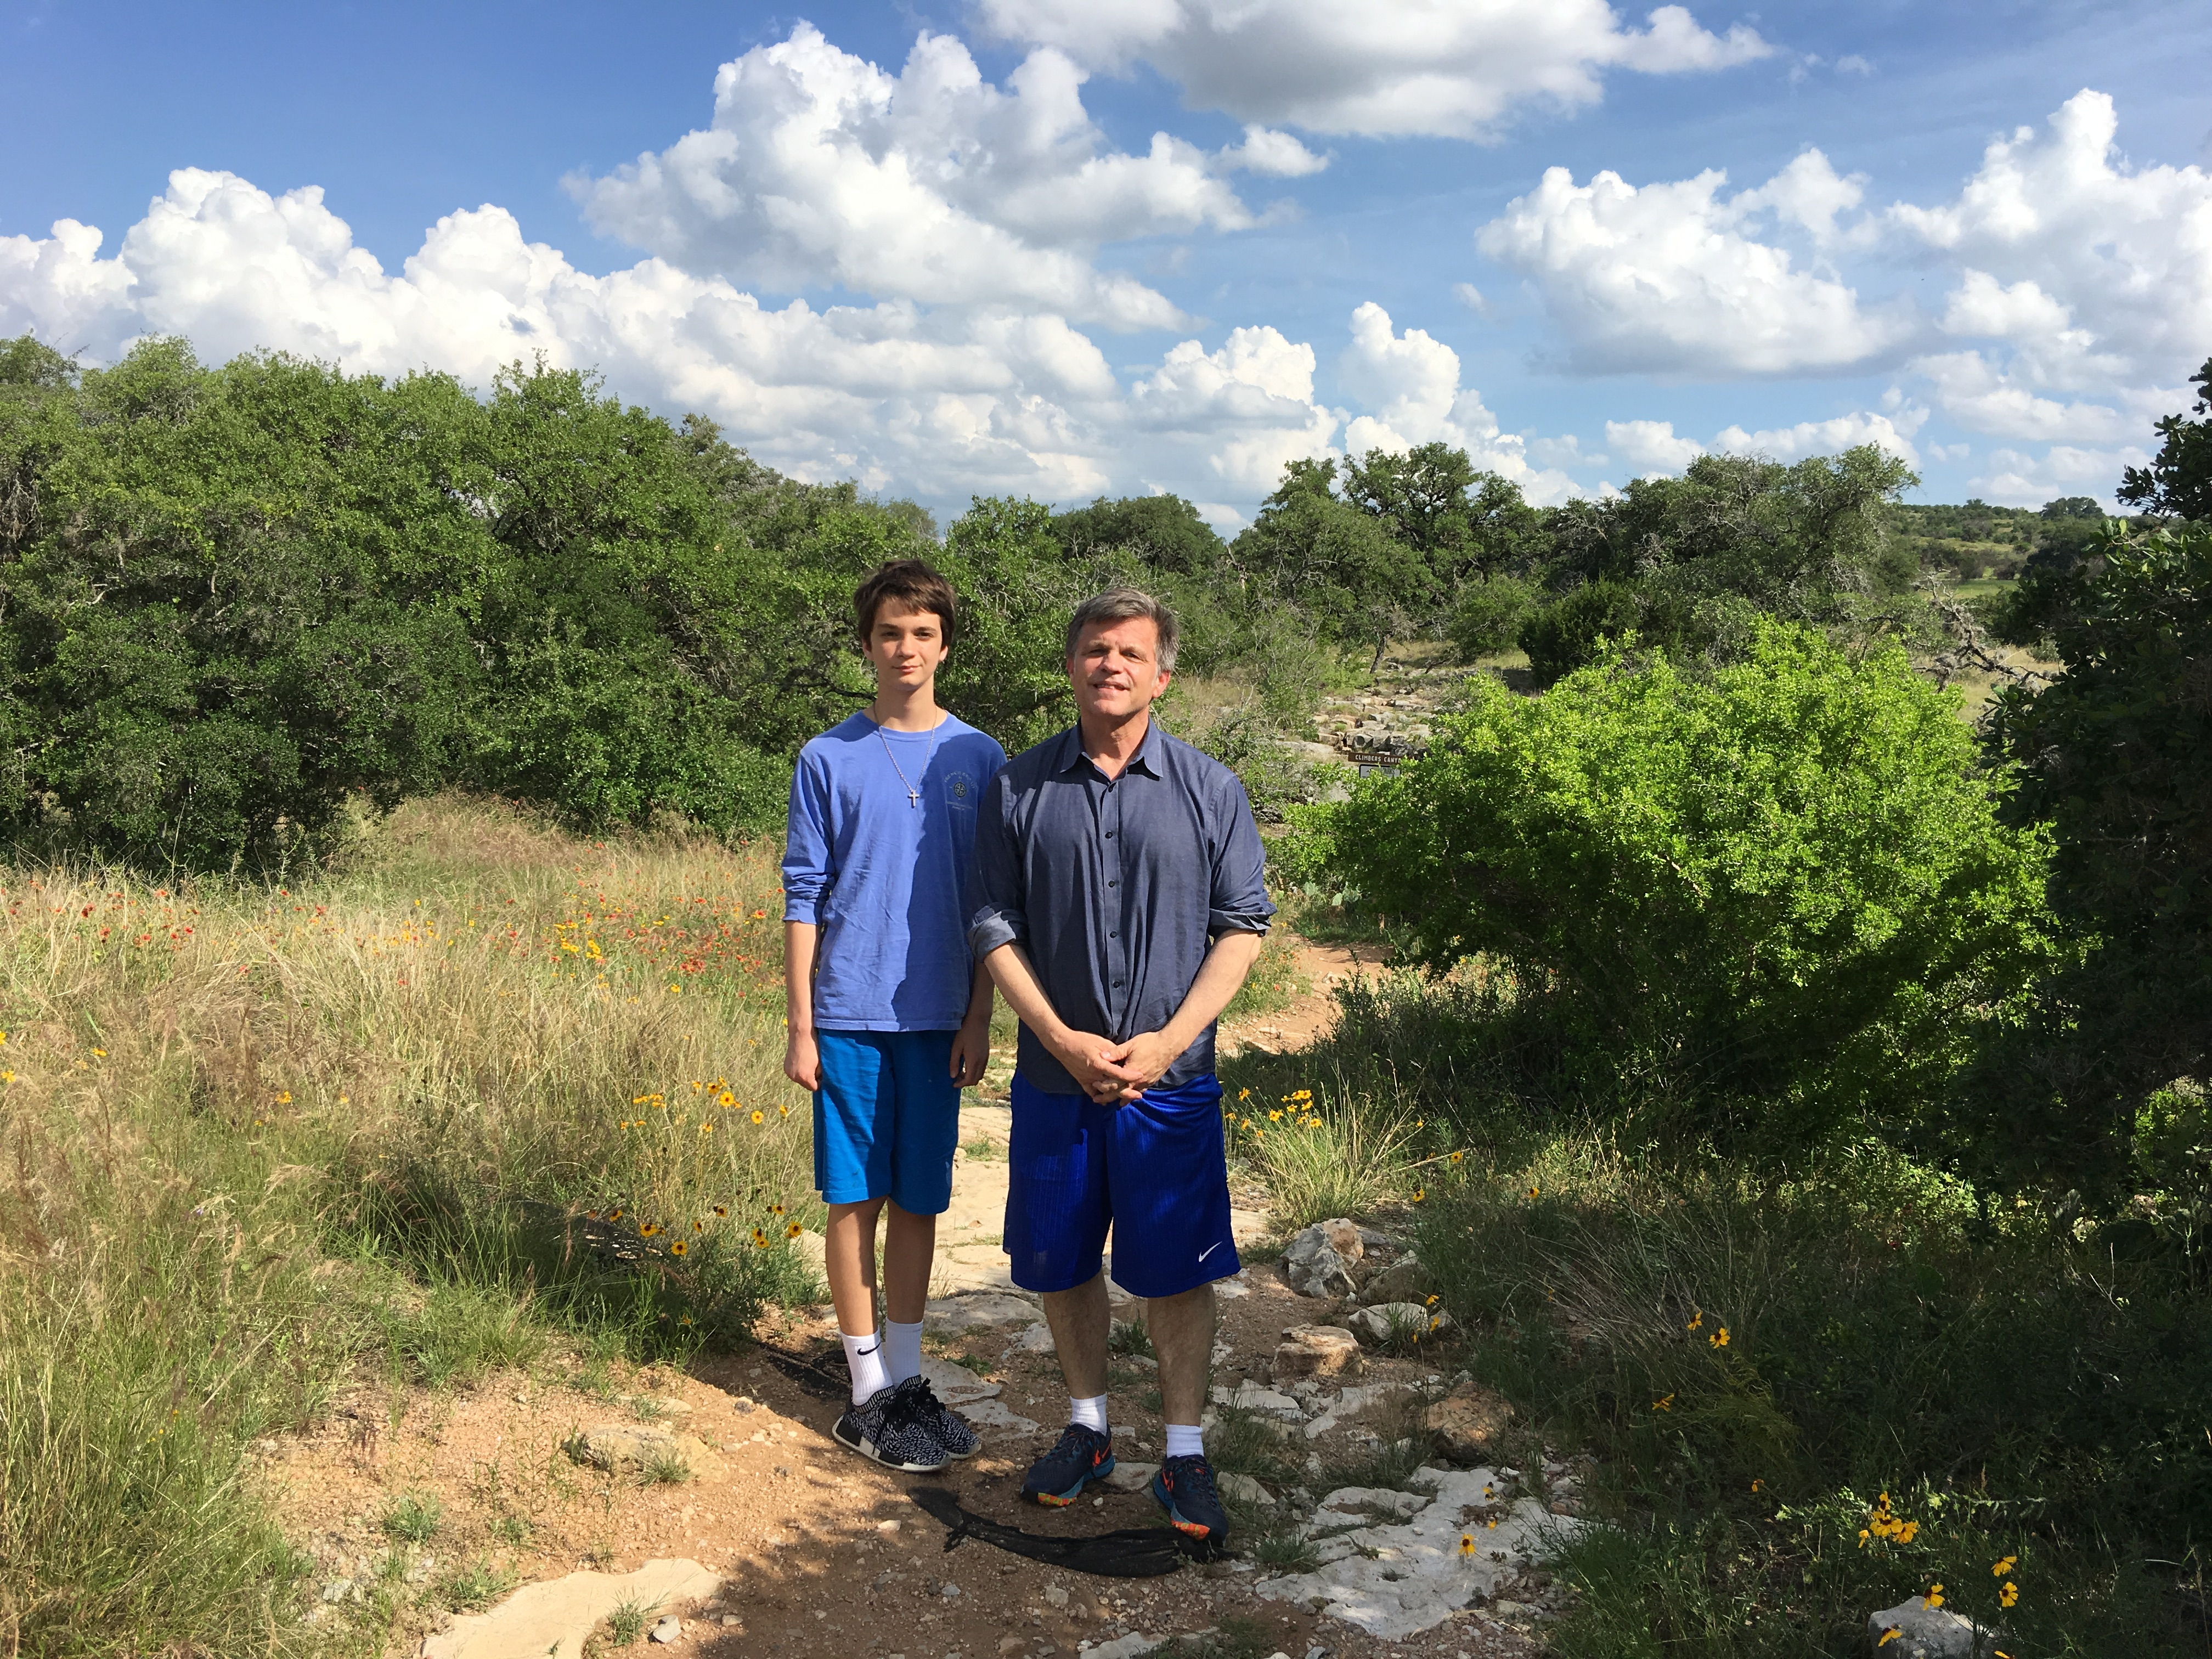 Douglas Brinkley and son Johnny